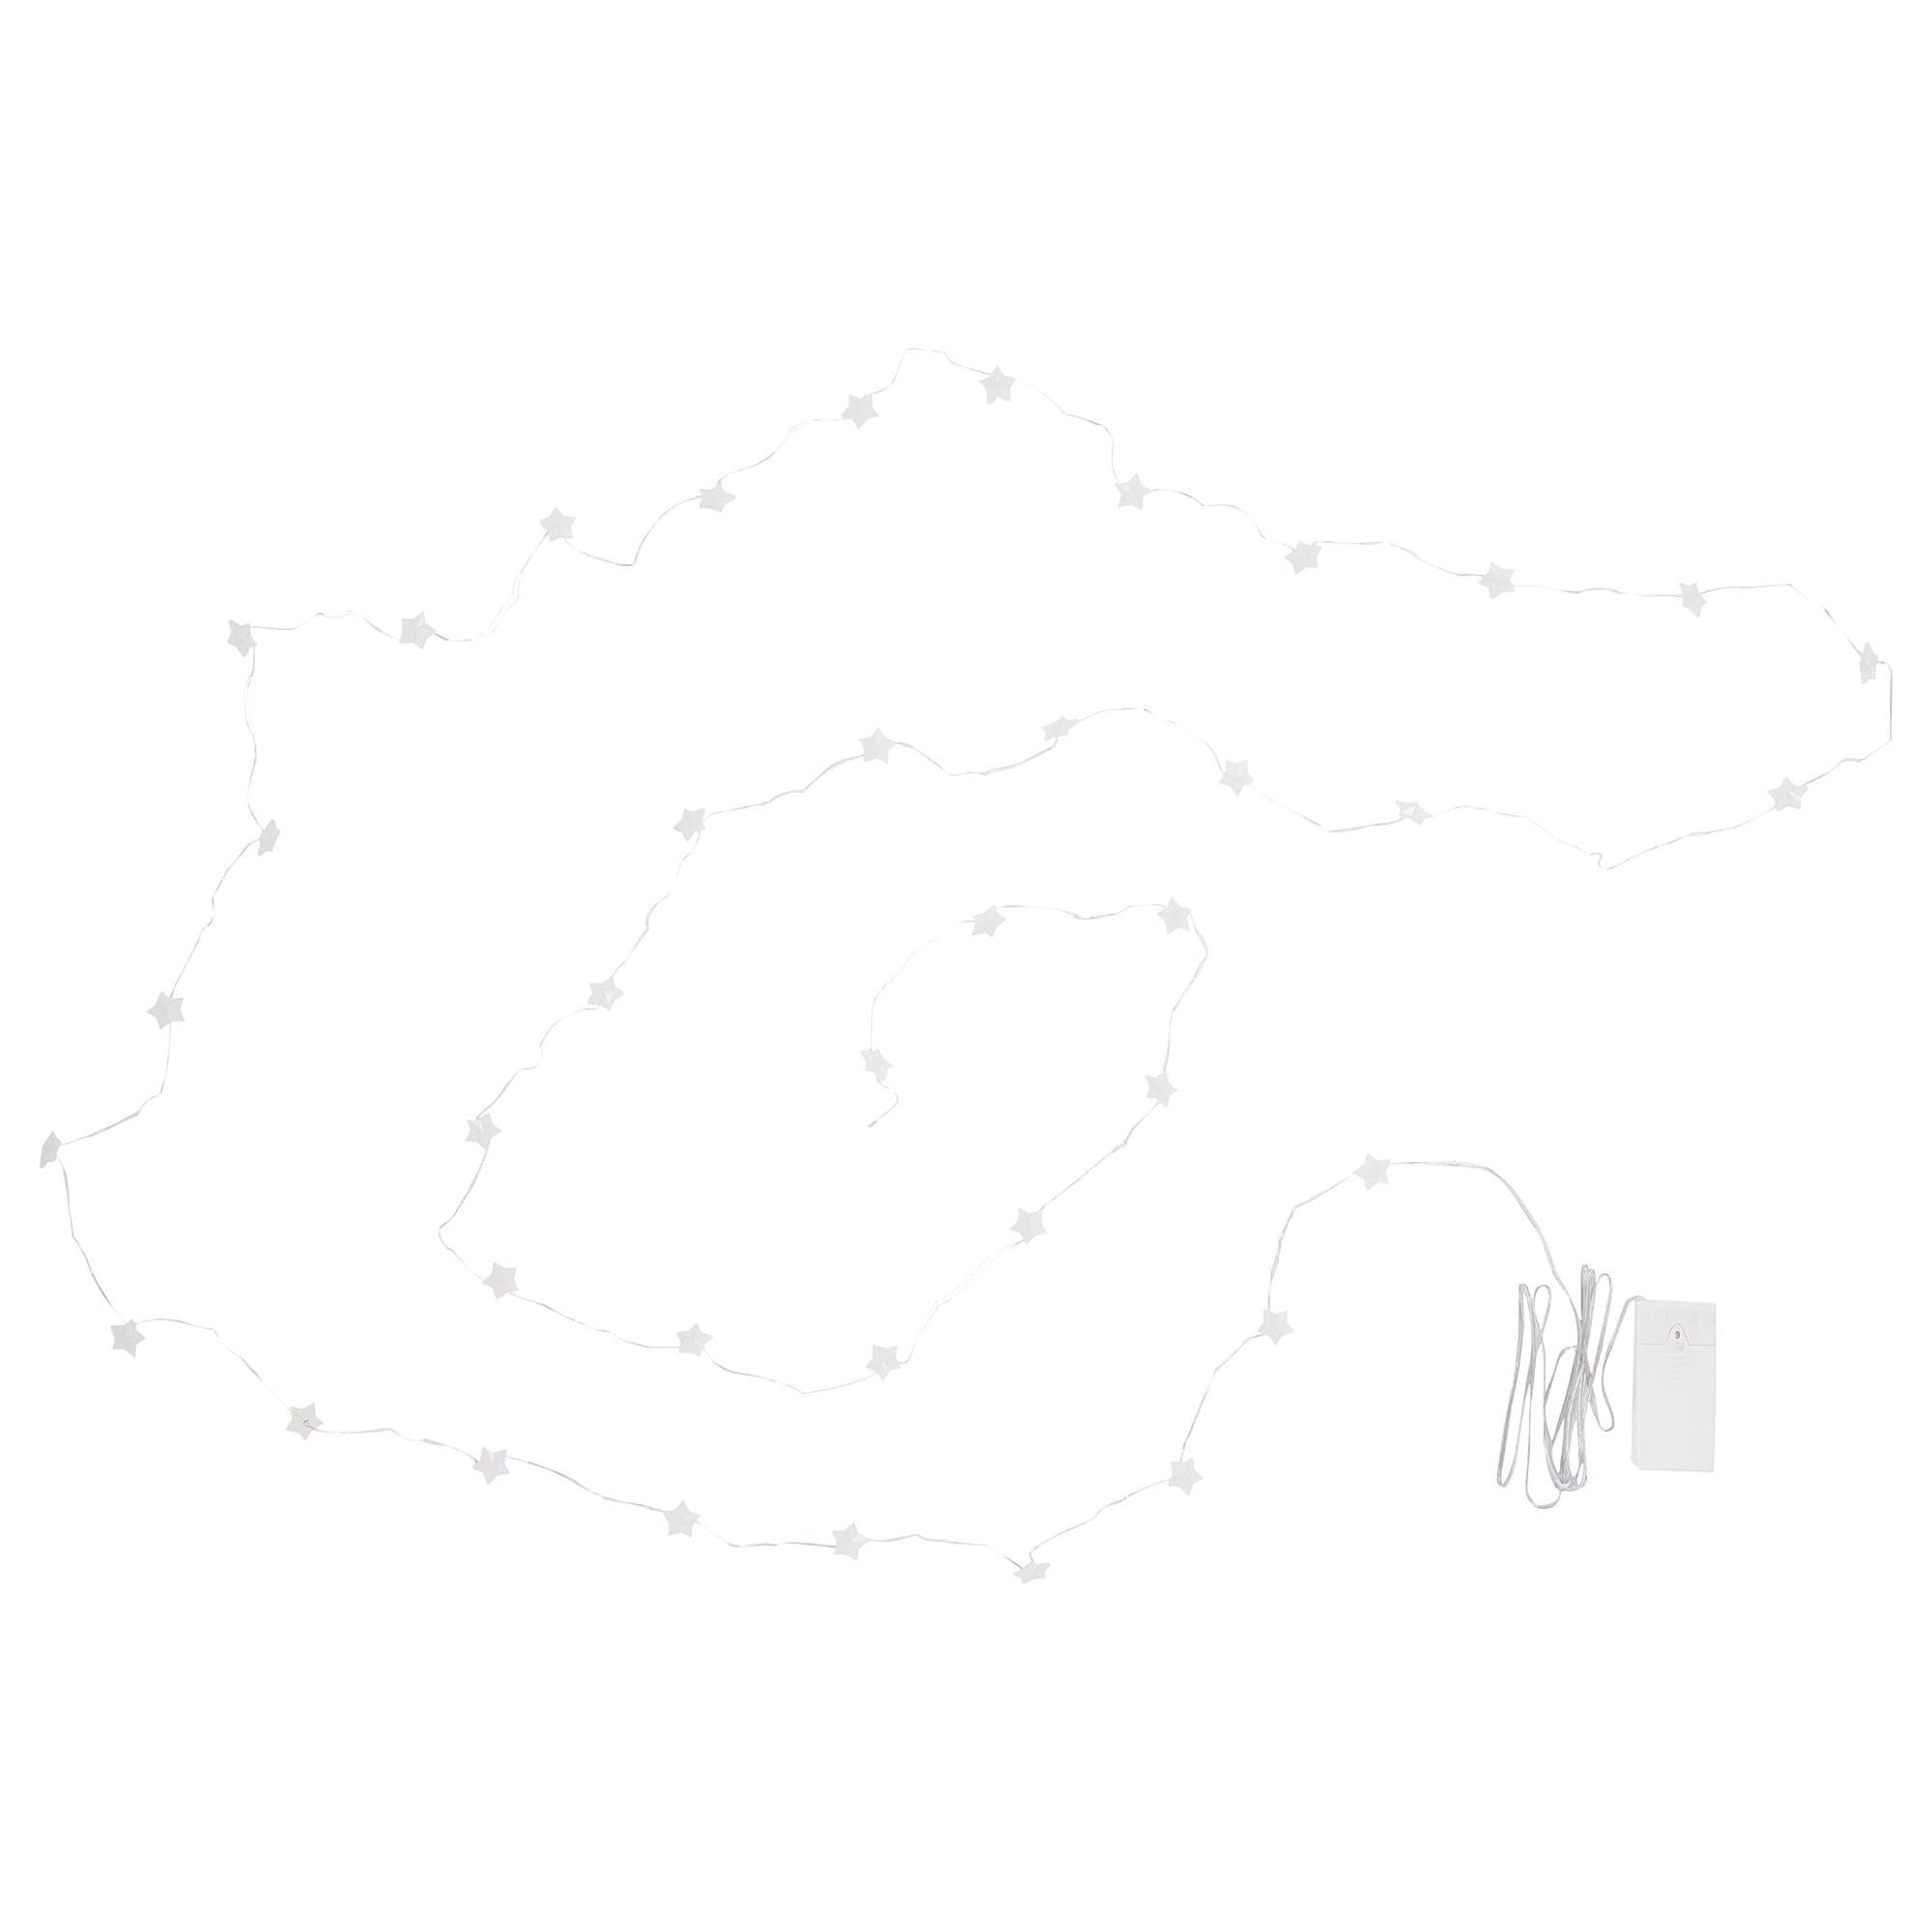 Гирлянда, 40 светодиодов СТРОЛА артикуль № 304.089.60 в наличии. Онлайн магазин IKEA Беларусь. Недорогая доставка и соборка.